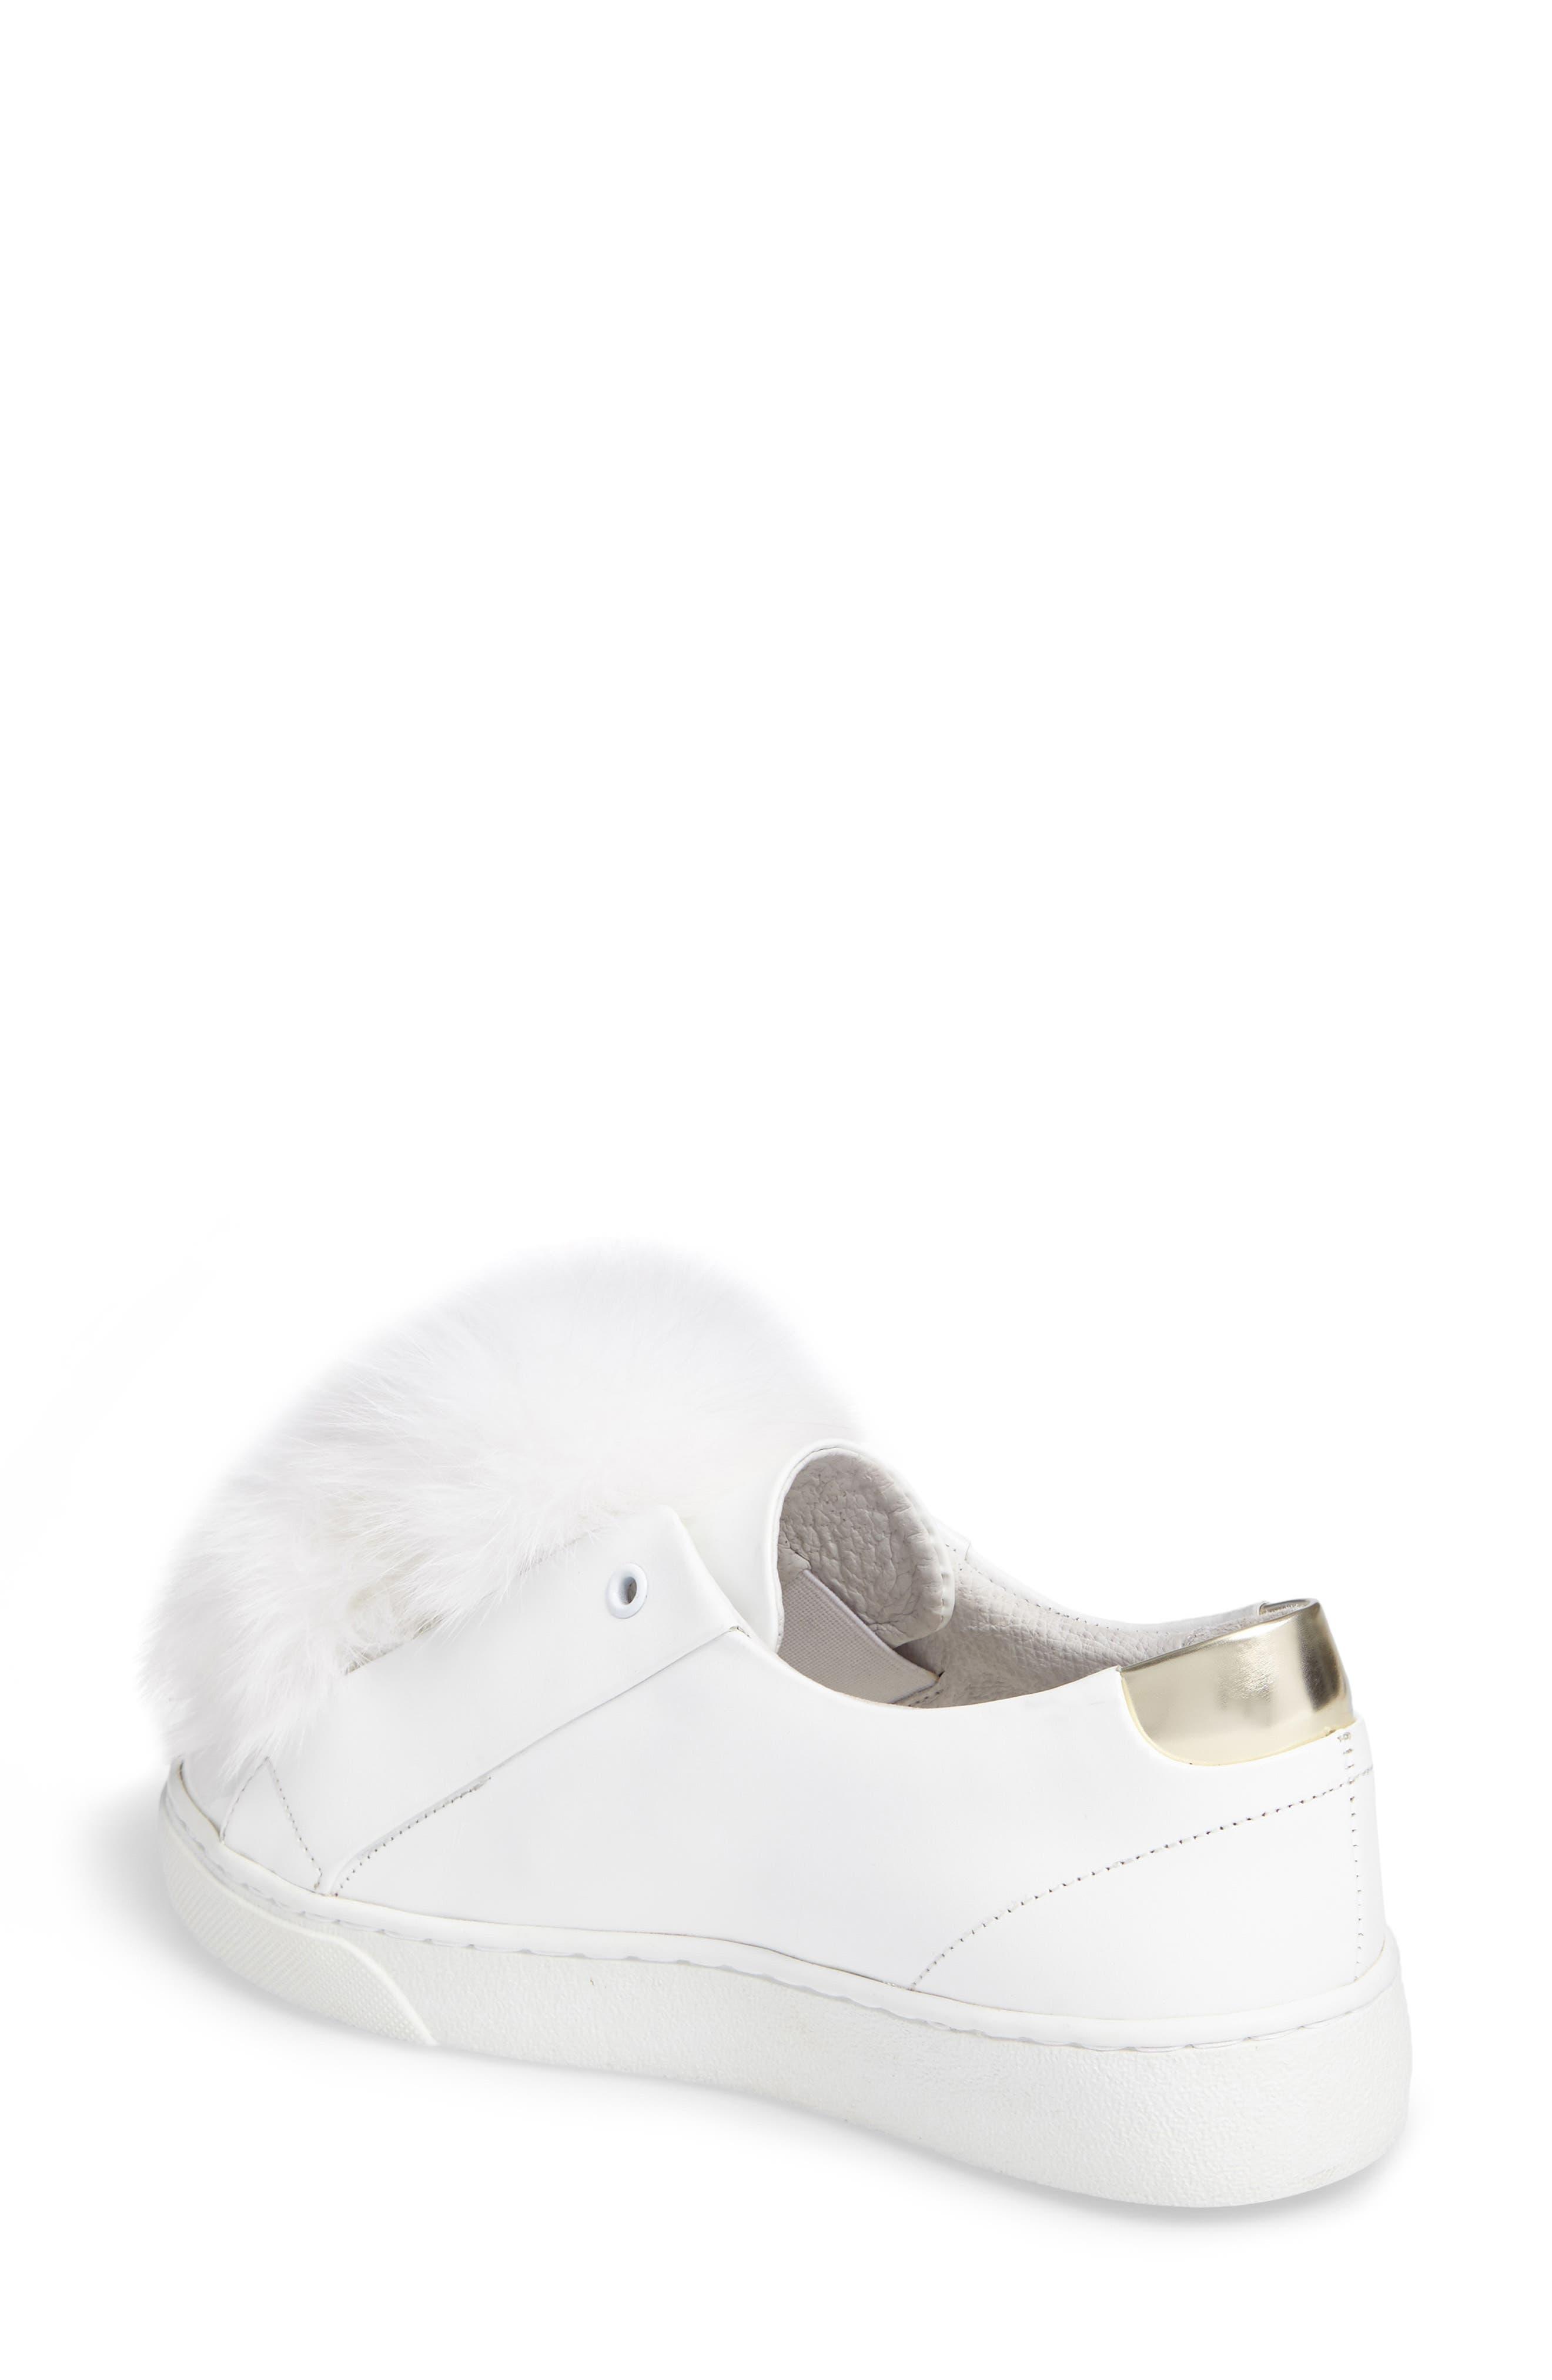 Sugar Genuine Fox Fur Slip-On Sneaker,                             Alternate thumbnail 2, color,                             100